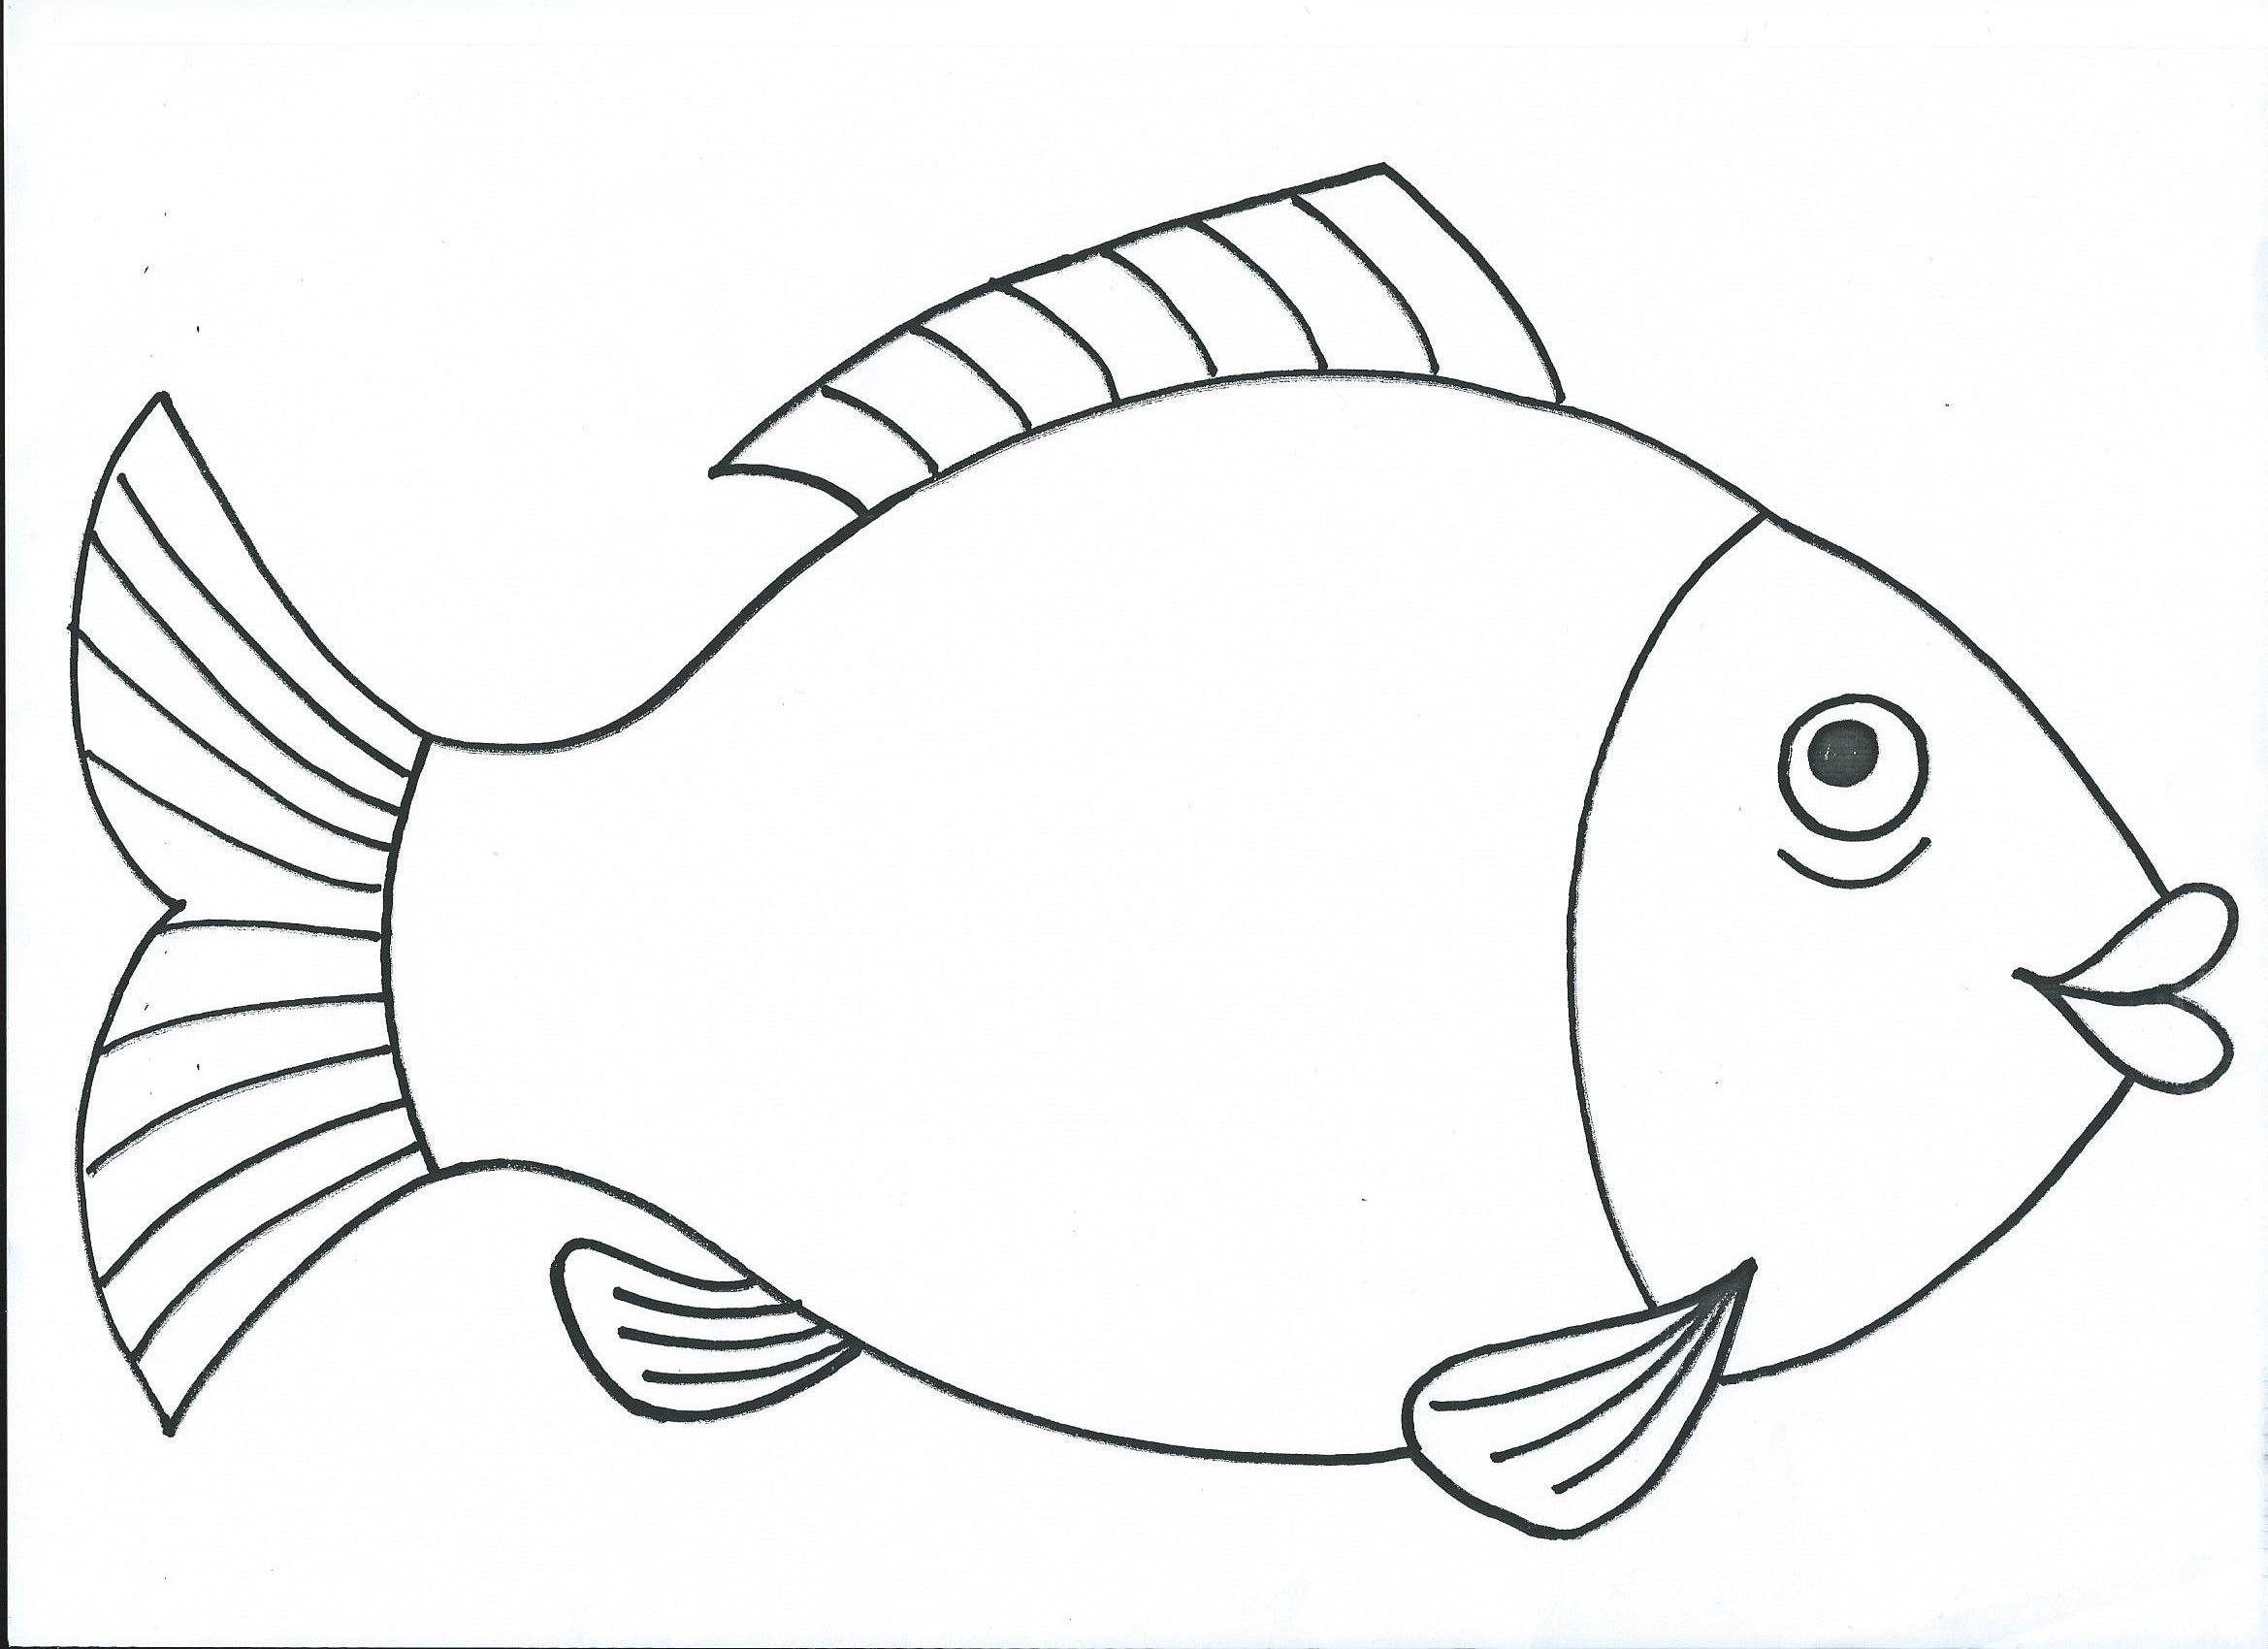 10 Mewarnai Gambar Ikan Mas bonikids Coloring Page Pinterest